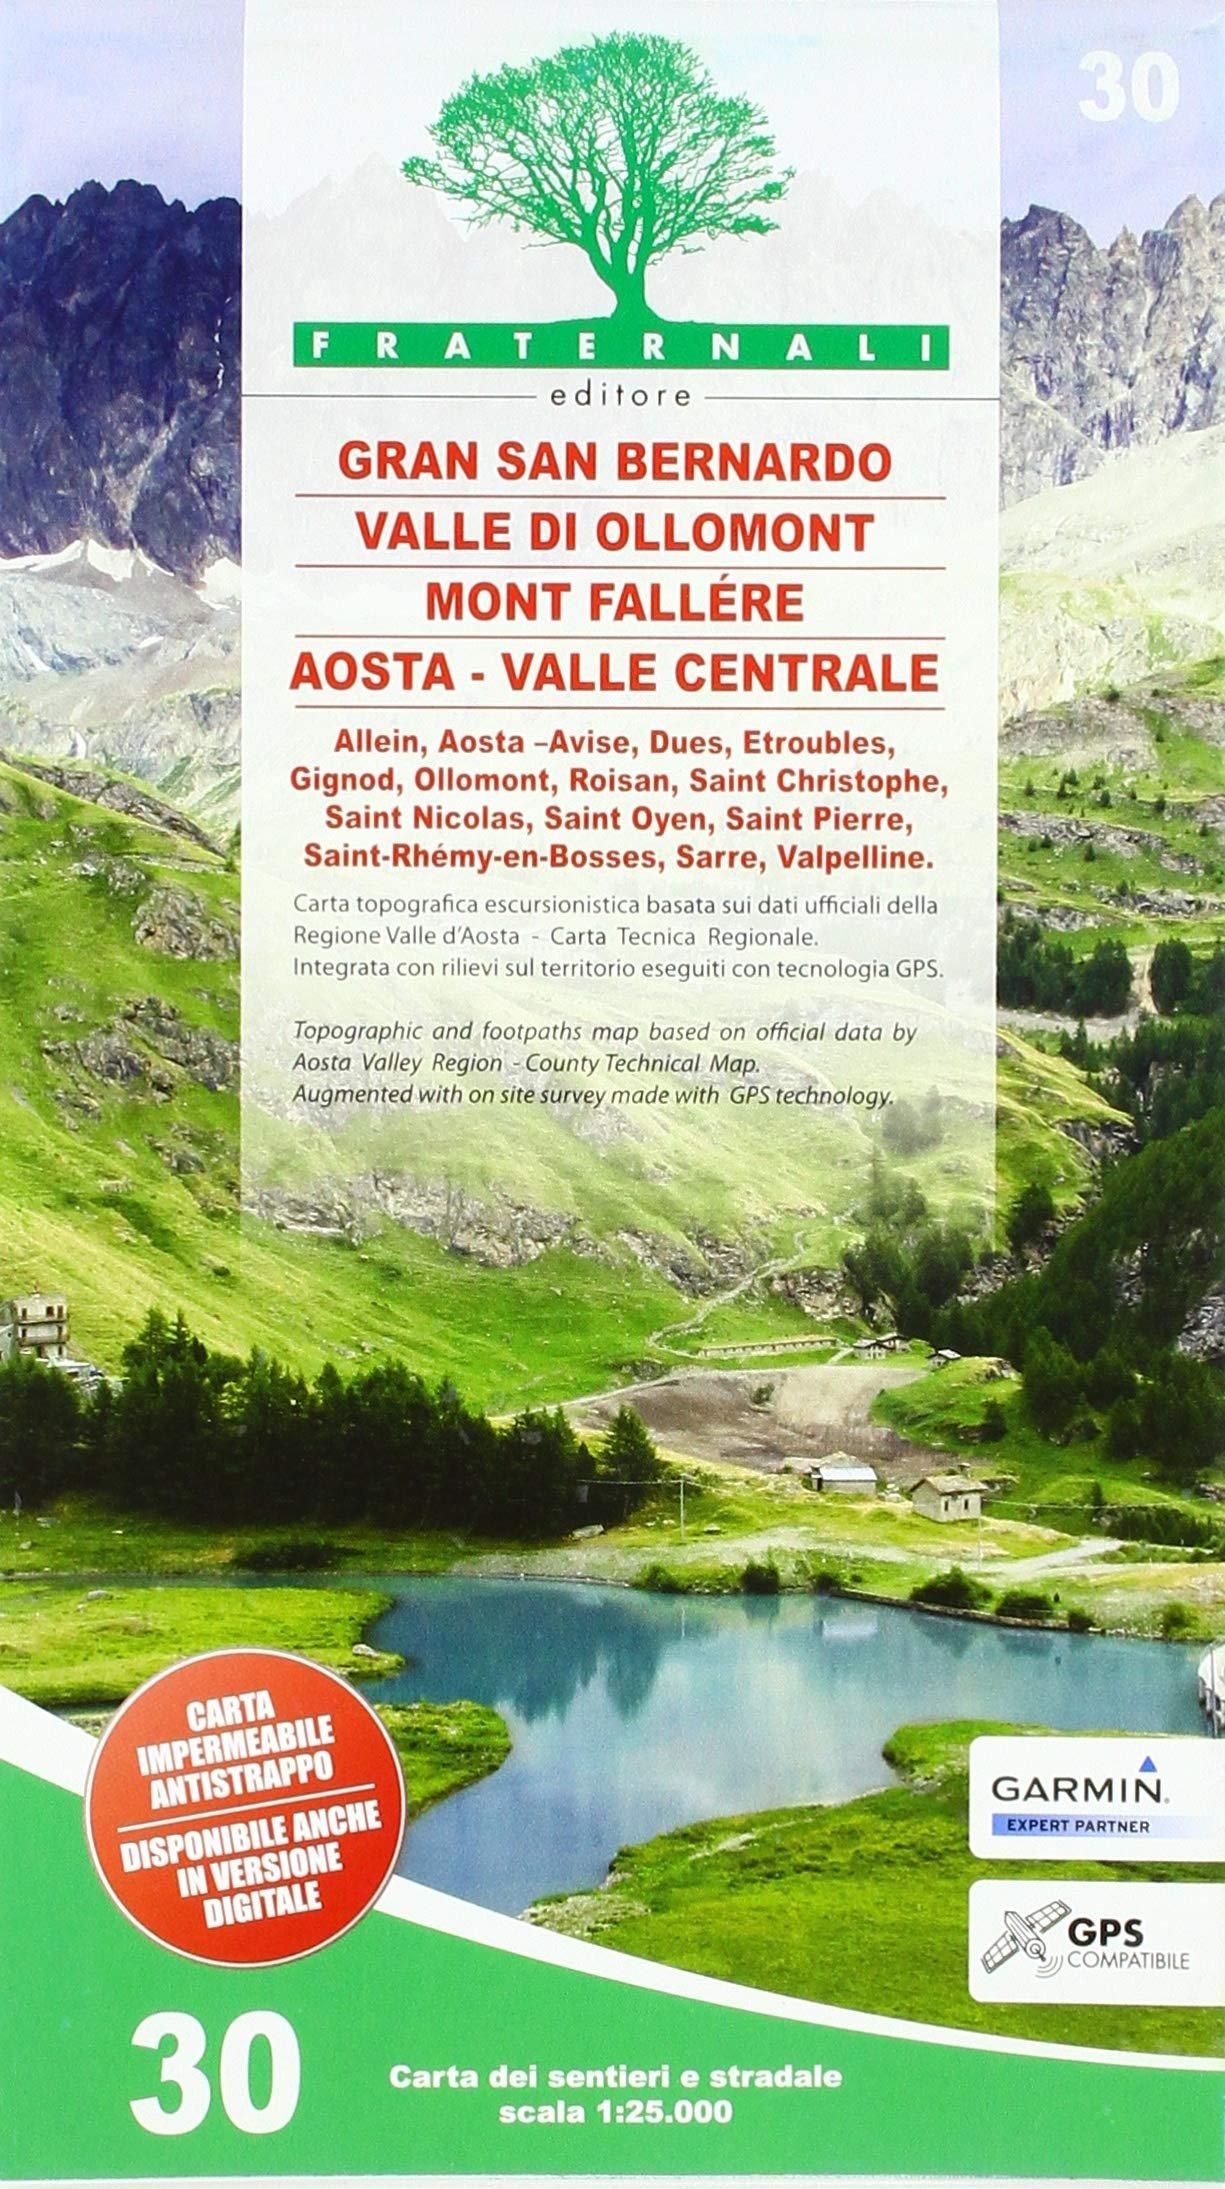 FRA-30 Gran San Bernardo - Valle di Ollomont-  Mont Fallére - Aosta | wandelkaart 1:25.000 9788897465478  Fraternali Editore   Wandelkaarten Ligurië, Piemonte, Lombardije